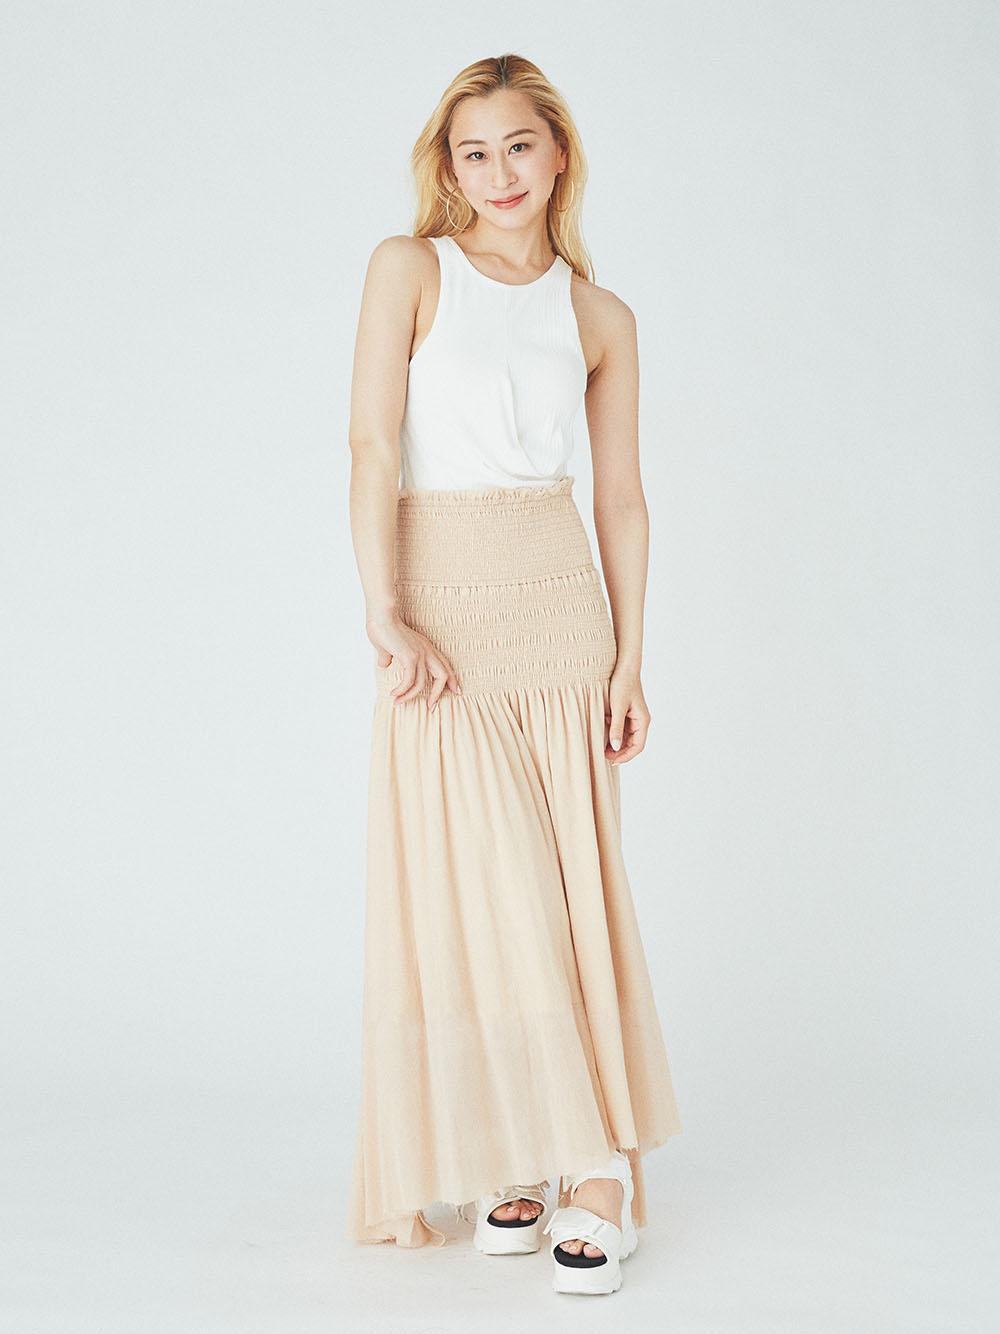 【emmi yoga】Select by aya yoga 2Way シャーリングスカート(ORG-F)